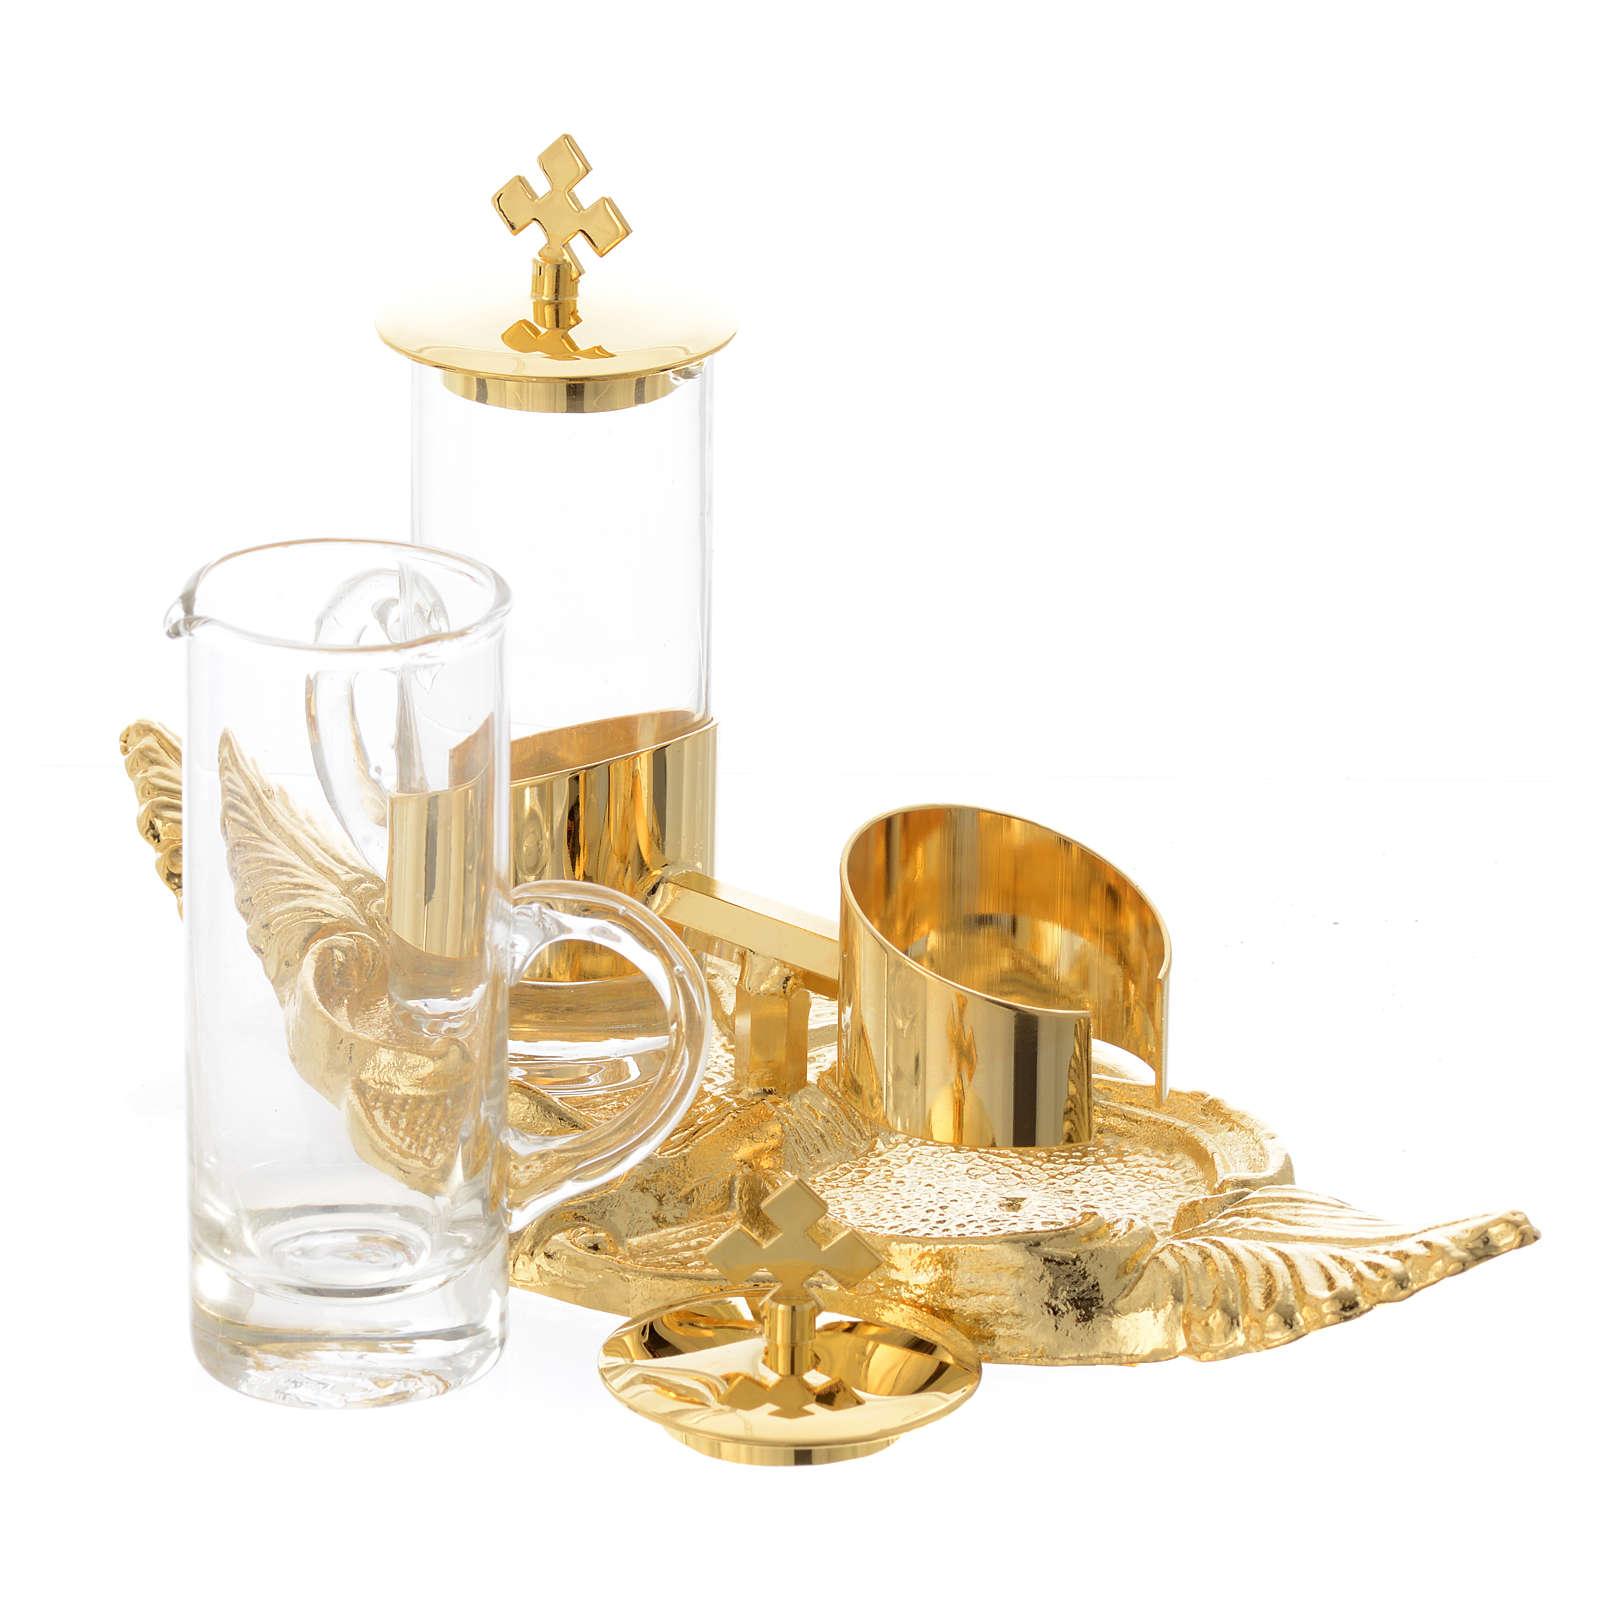 Vinajeras Palma 100 ml bandeja bronce dorado 4